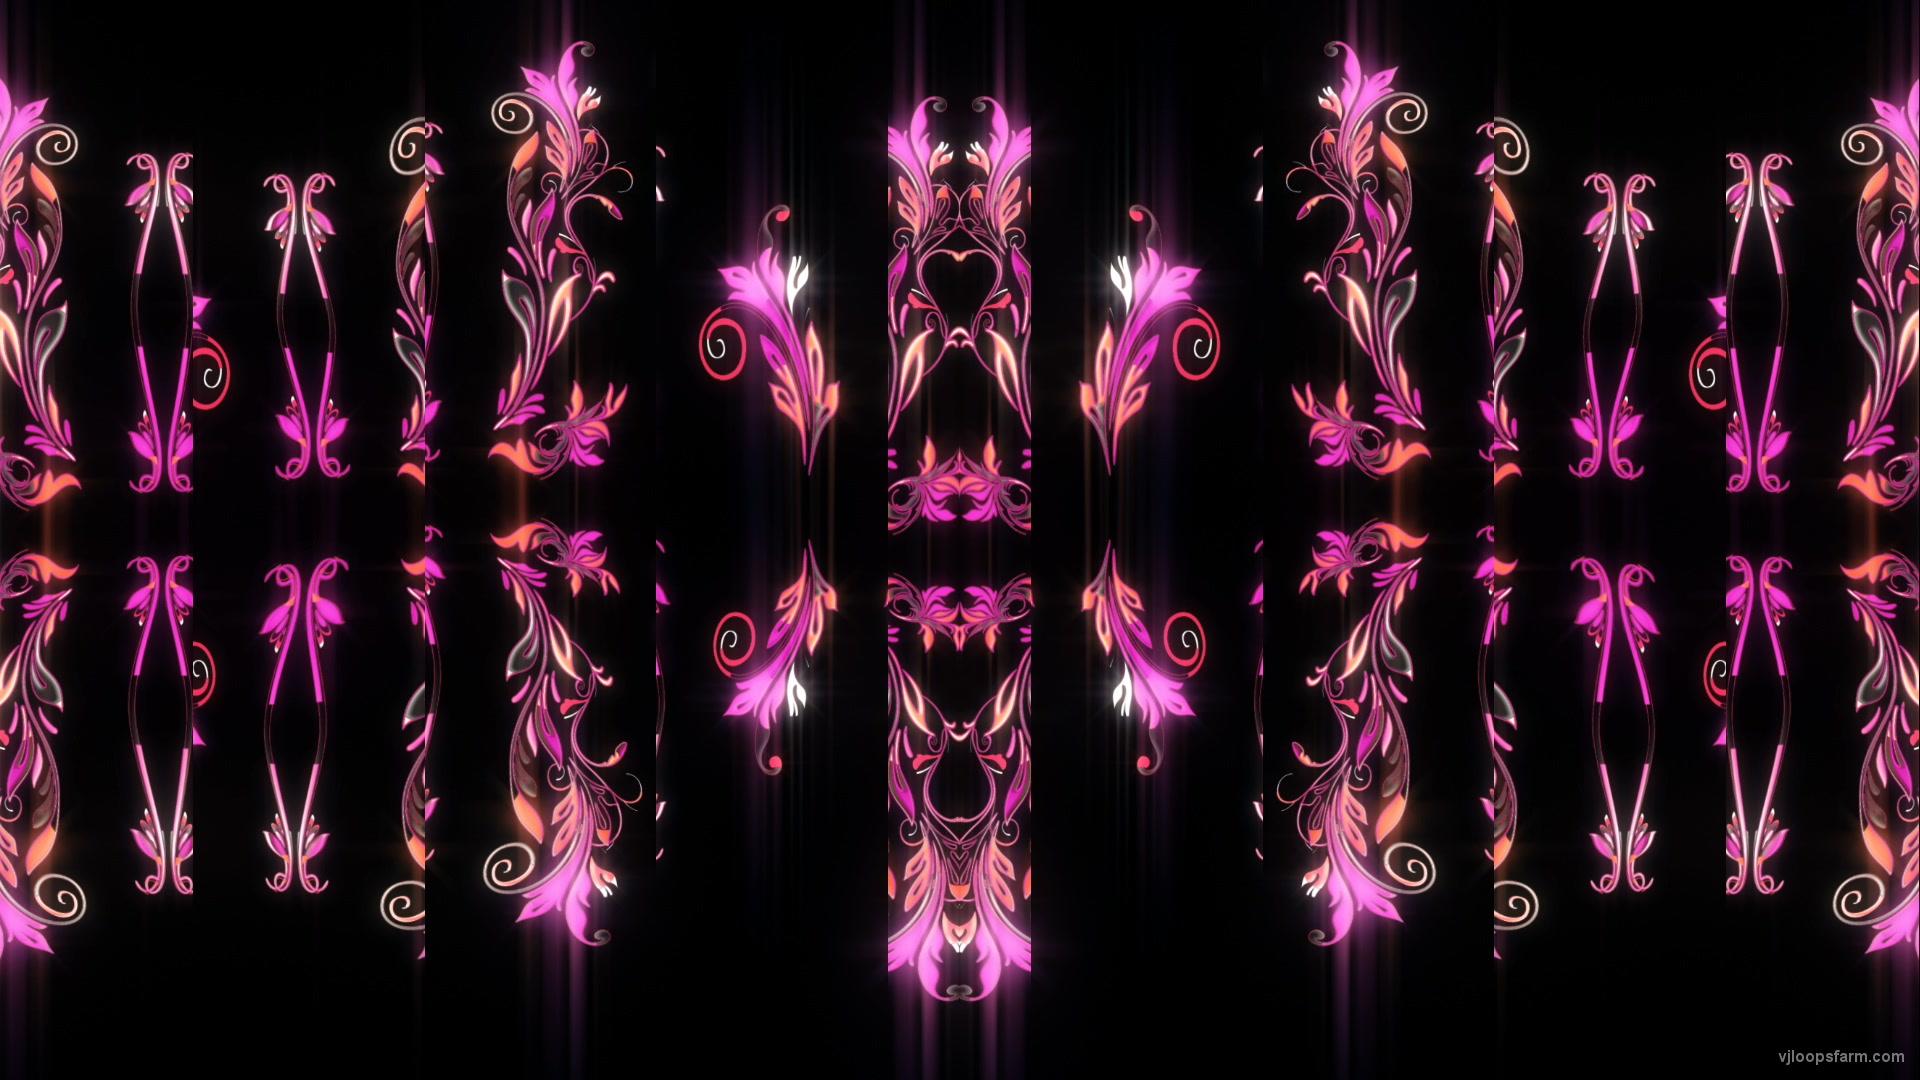 Psy Vintage Flame Decor Slide Glass Screen Video Art Vj Loop ...